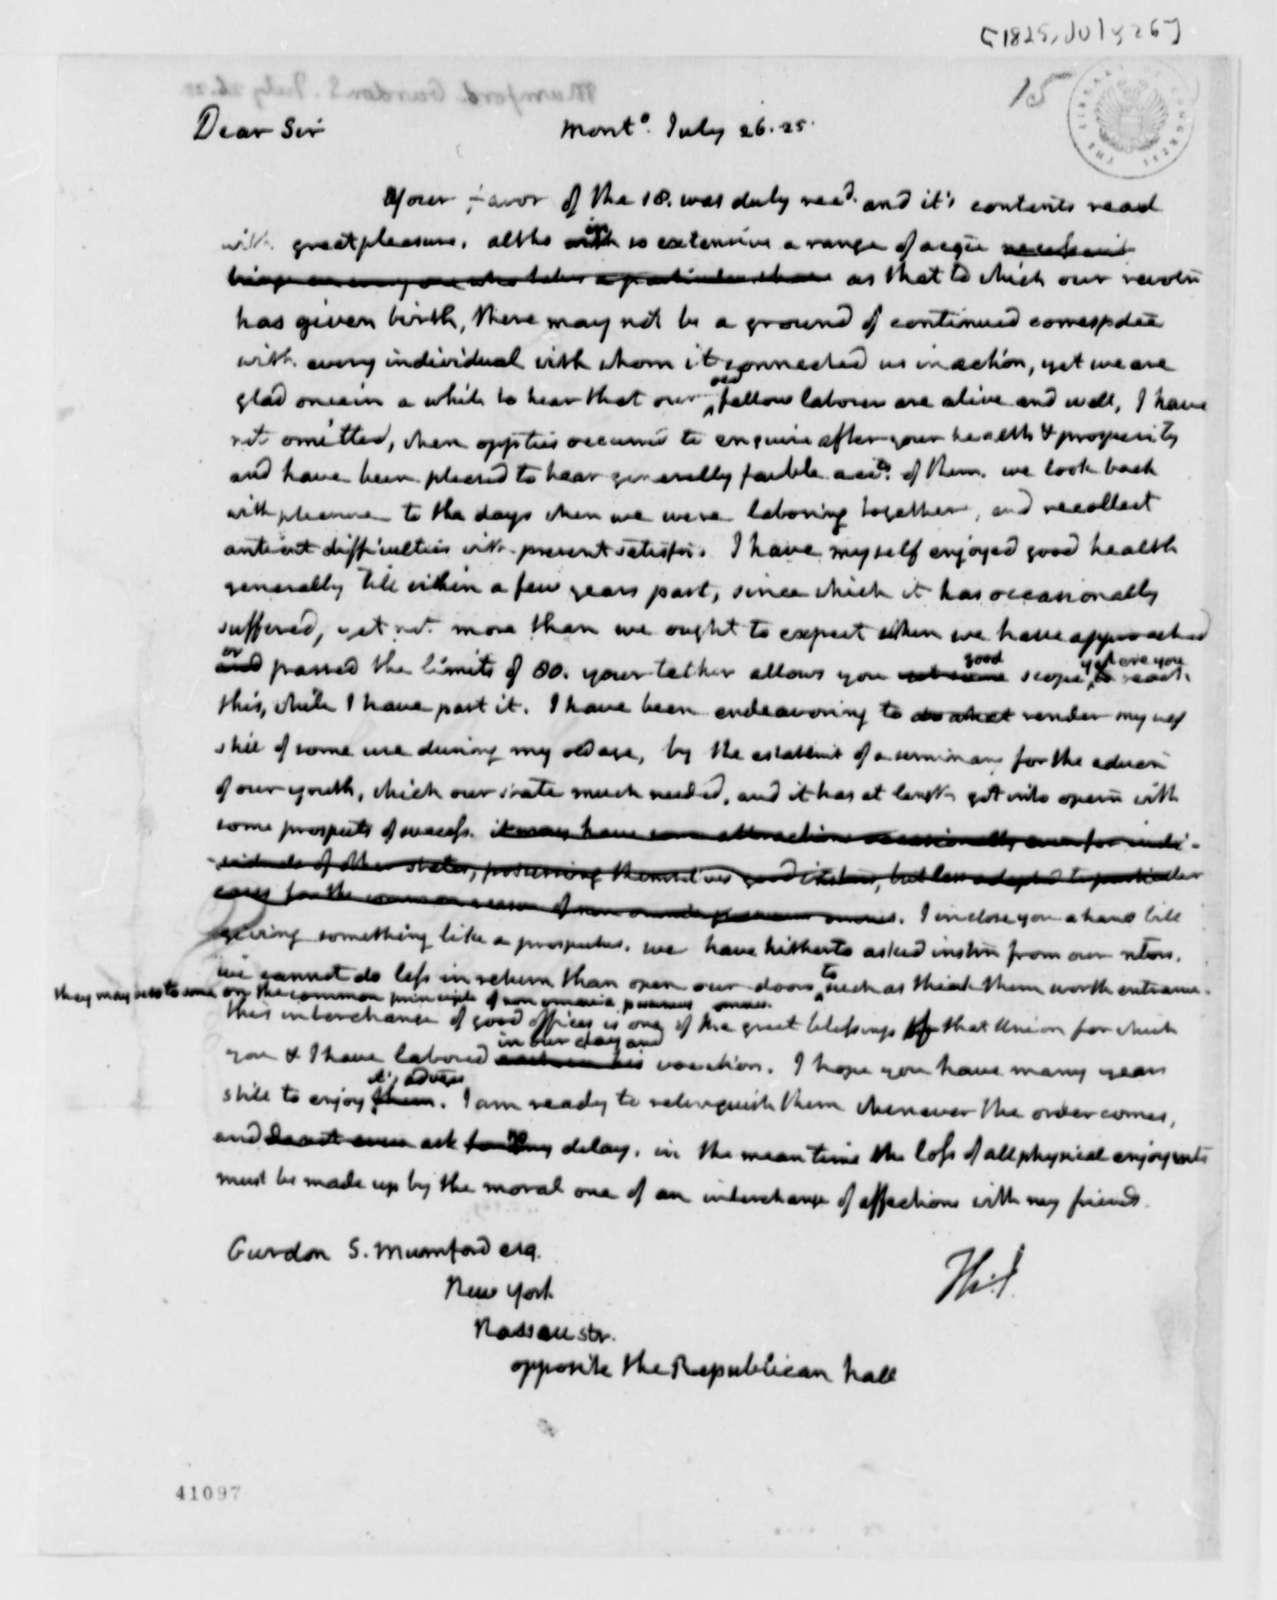 Thomas Jefferson to Gurdon S. Mumford, July 26, 1825